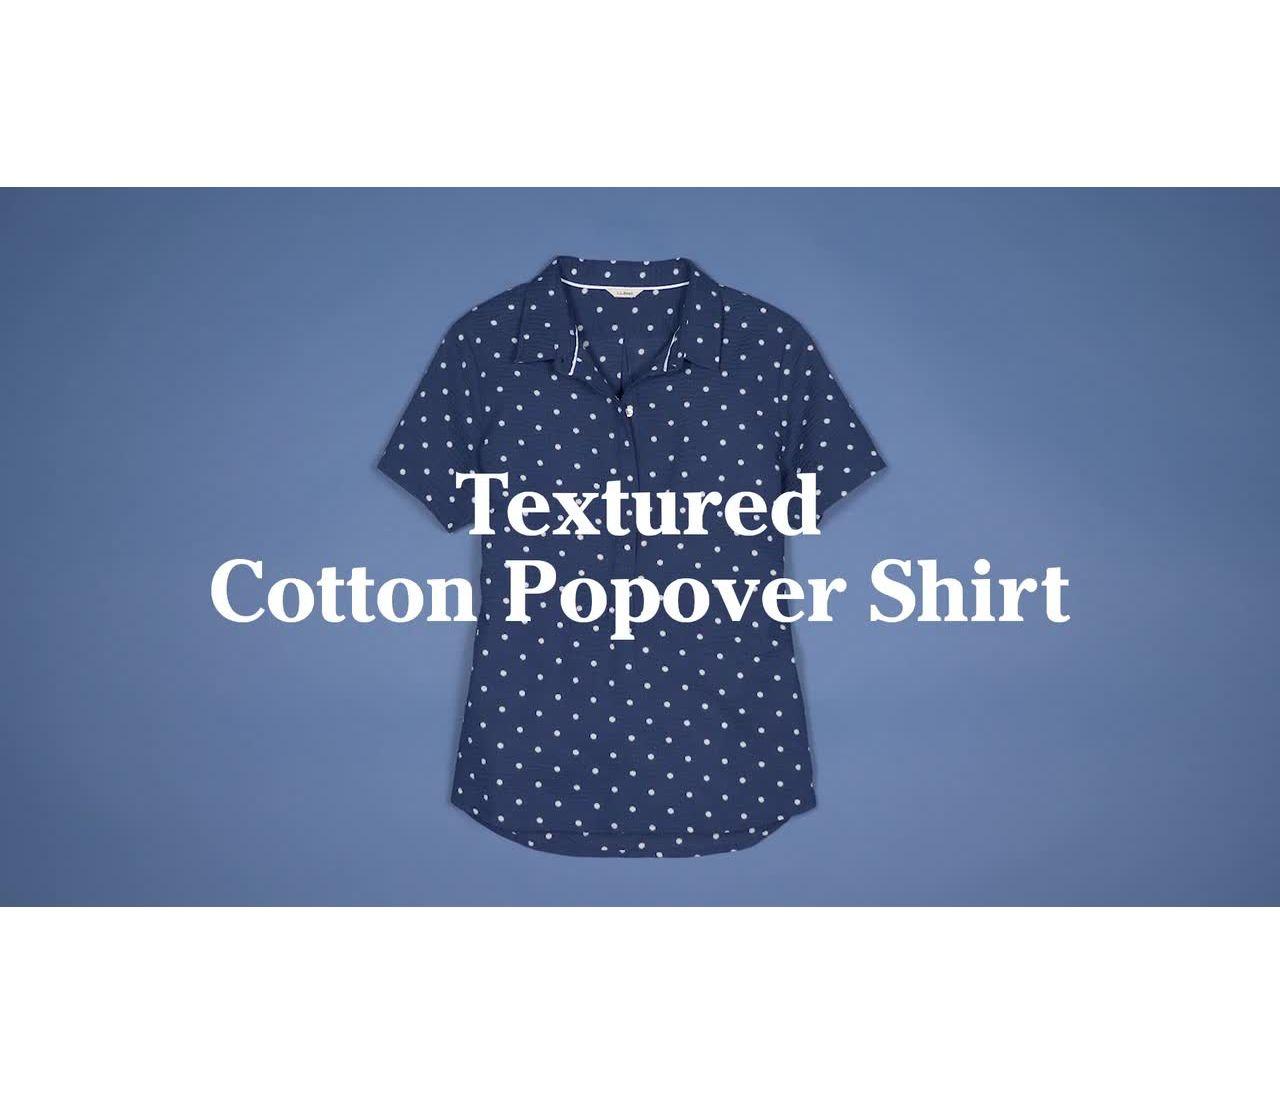 Video: Textured Cotton Popover Shirt Short Sleeve Print Misses